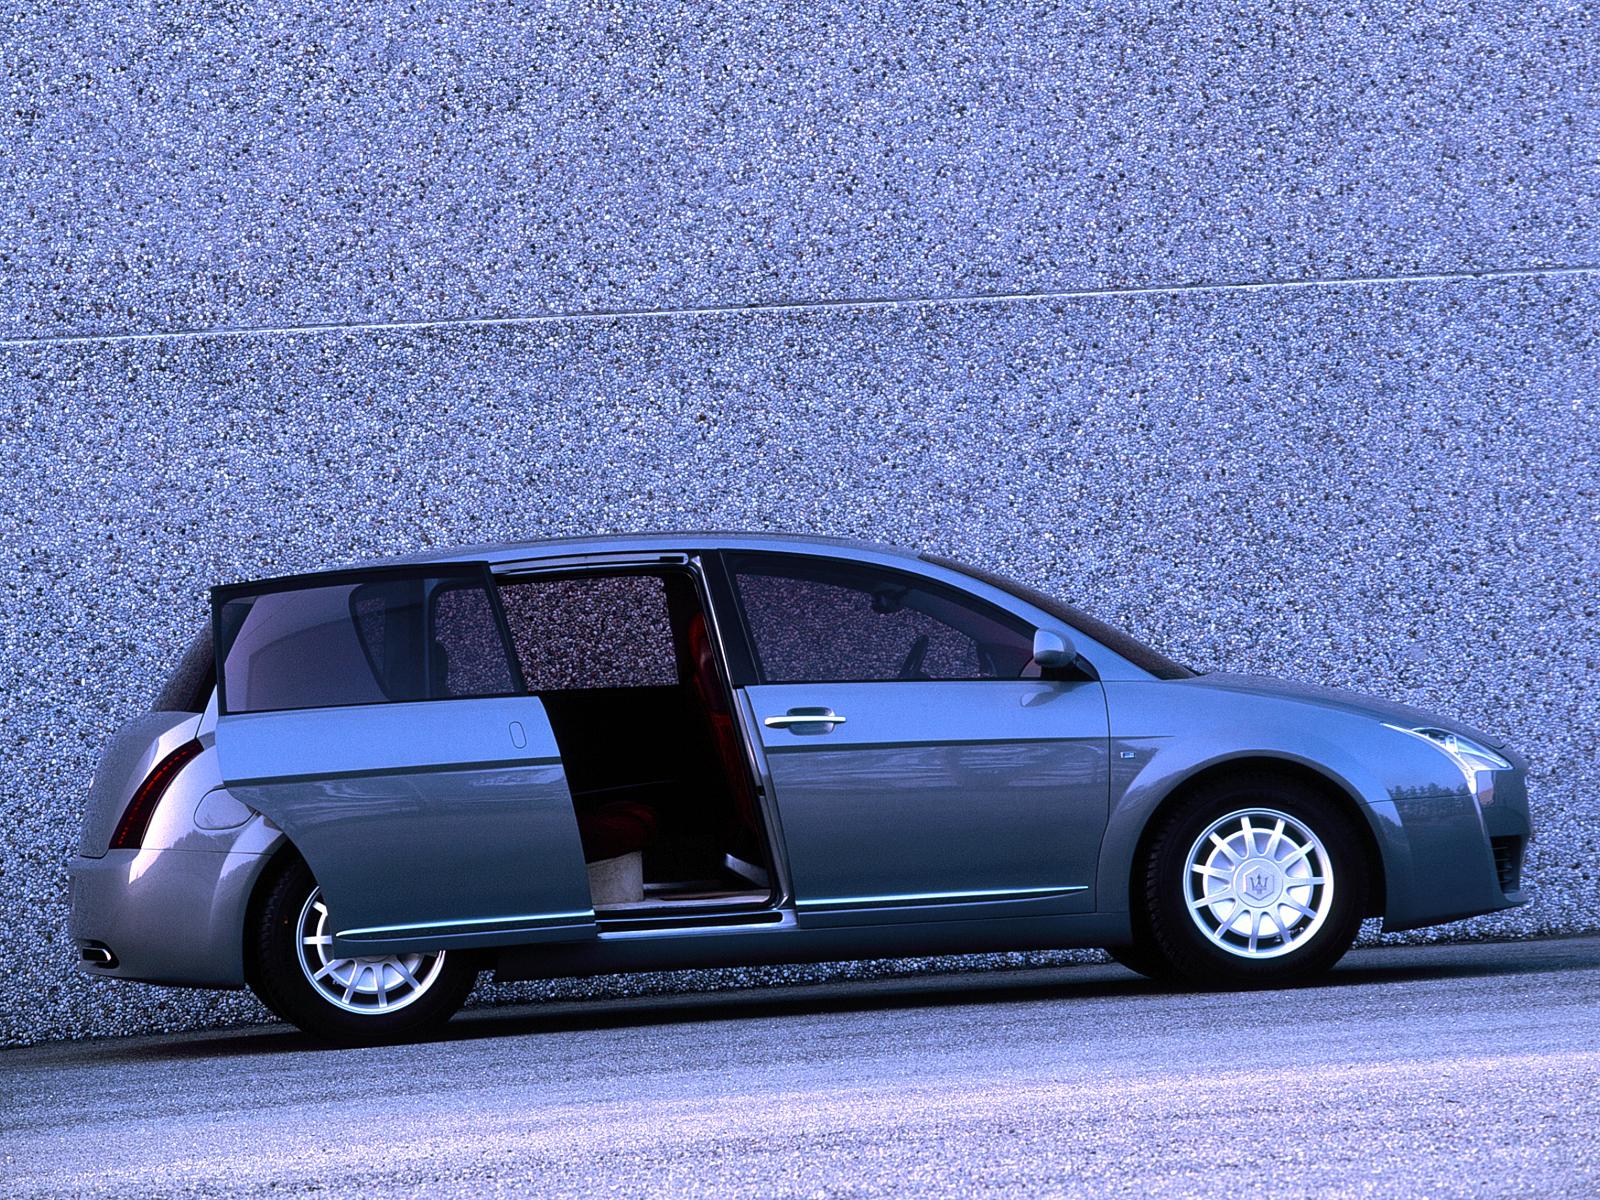 2000 Maserati Buran (ItalDesign) - Studios